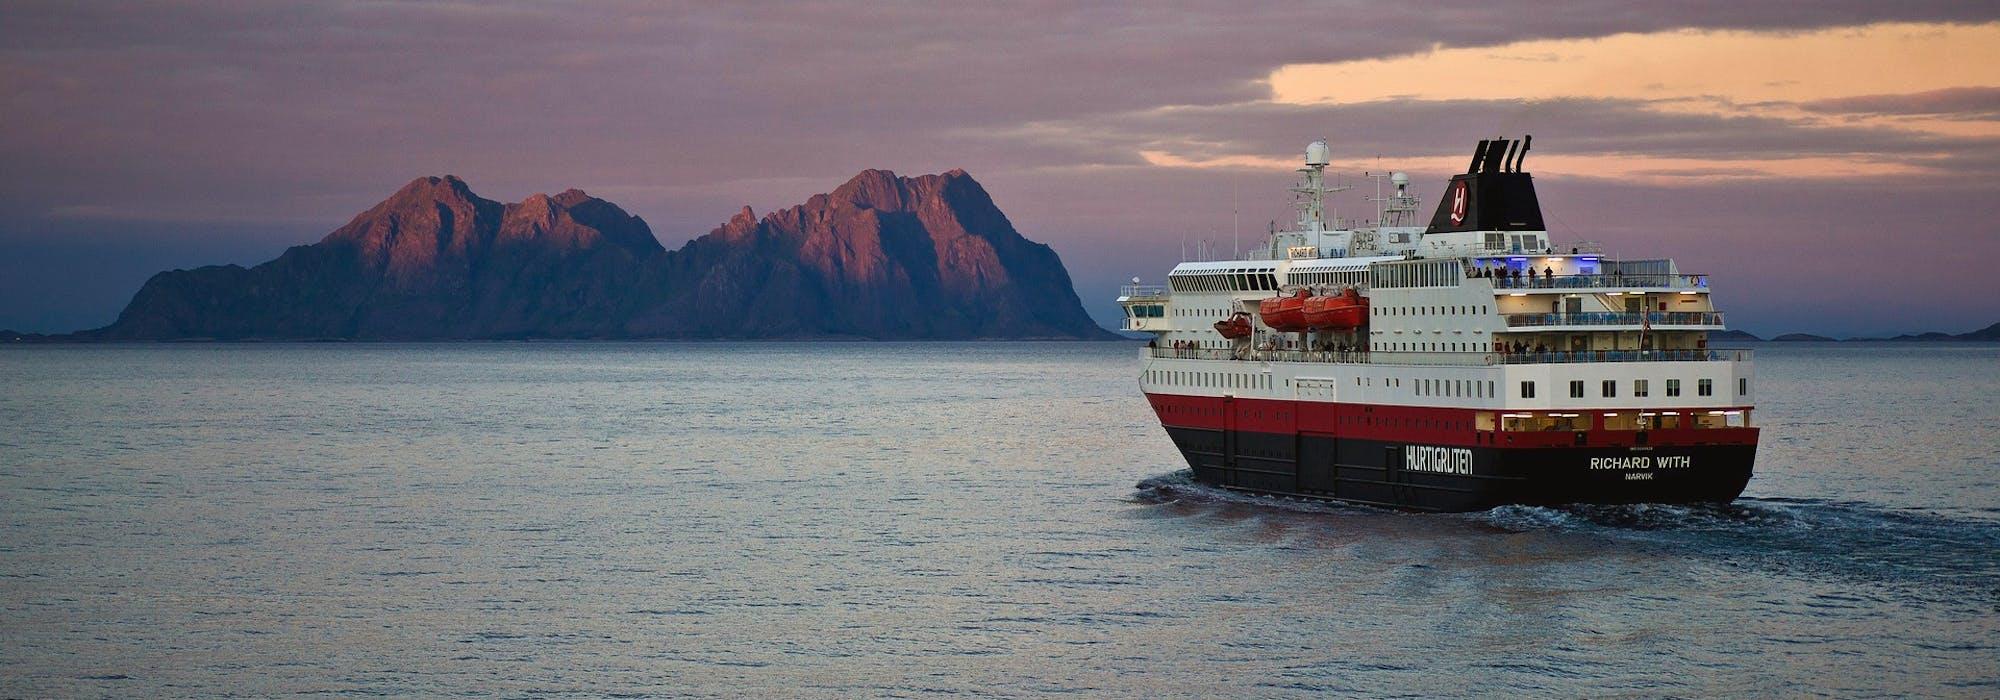 Bild på fartyget MS Richard With i solnedgången med ett berg i bakgrunden.